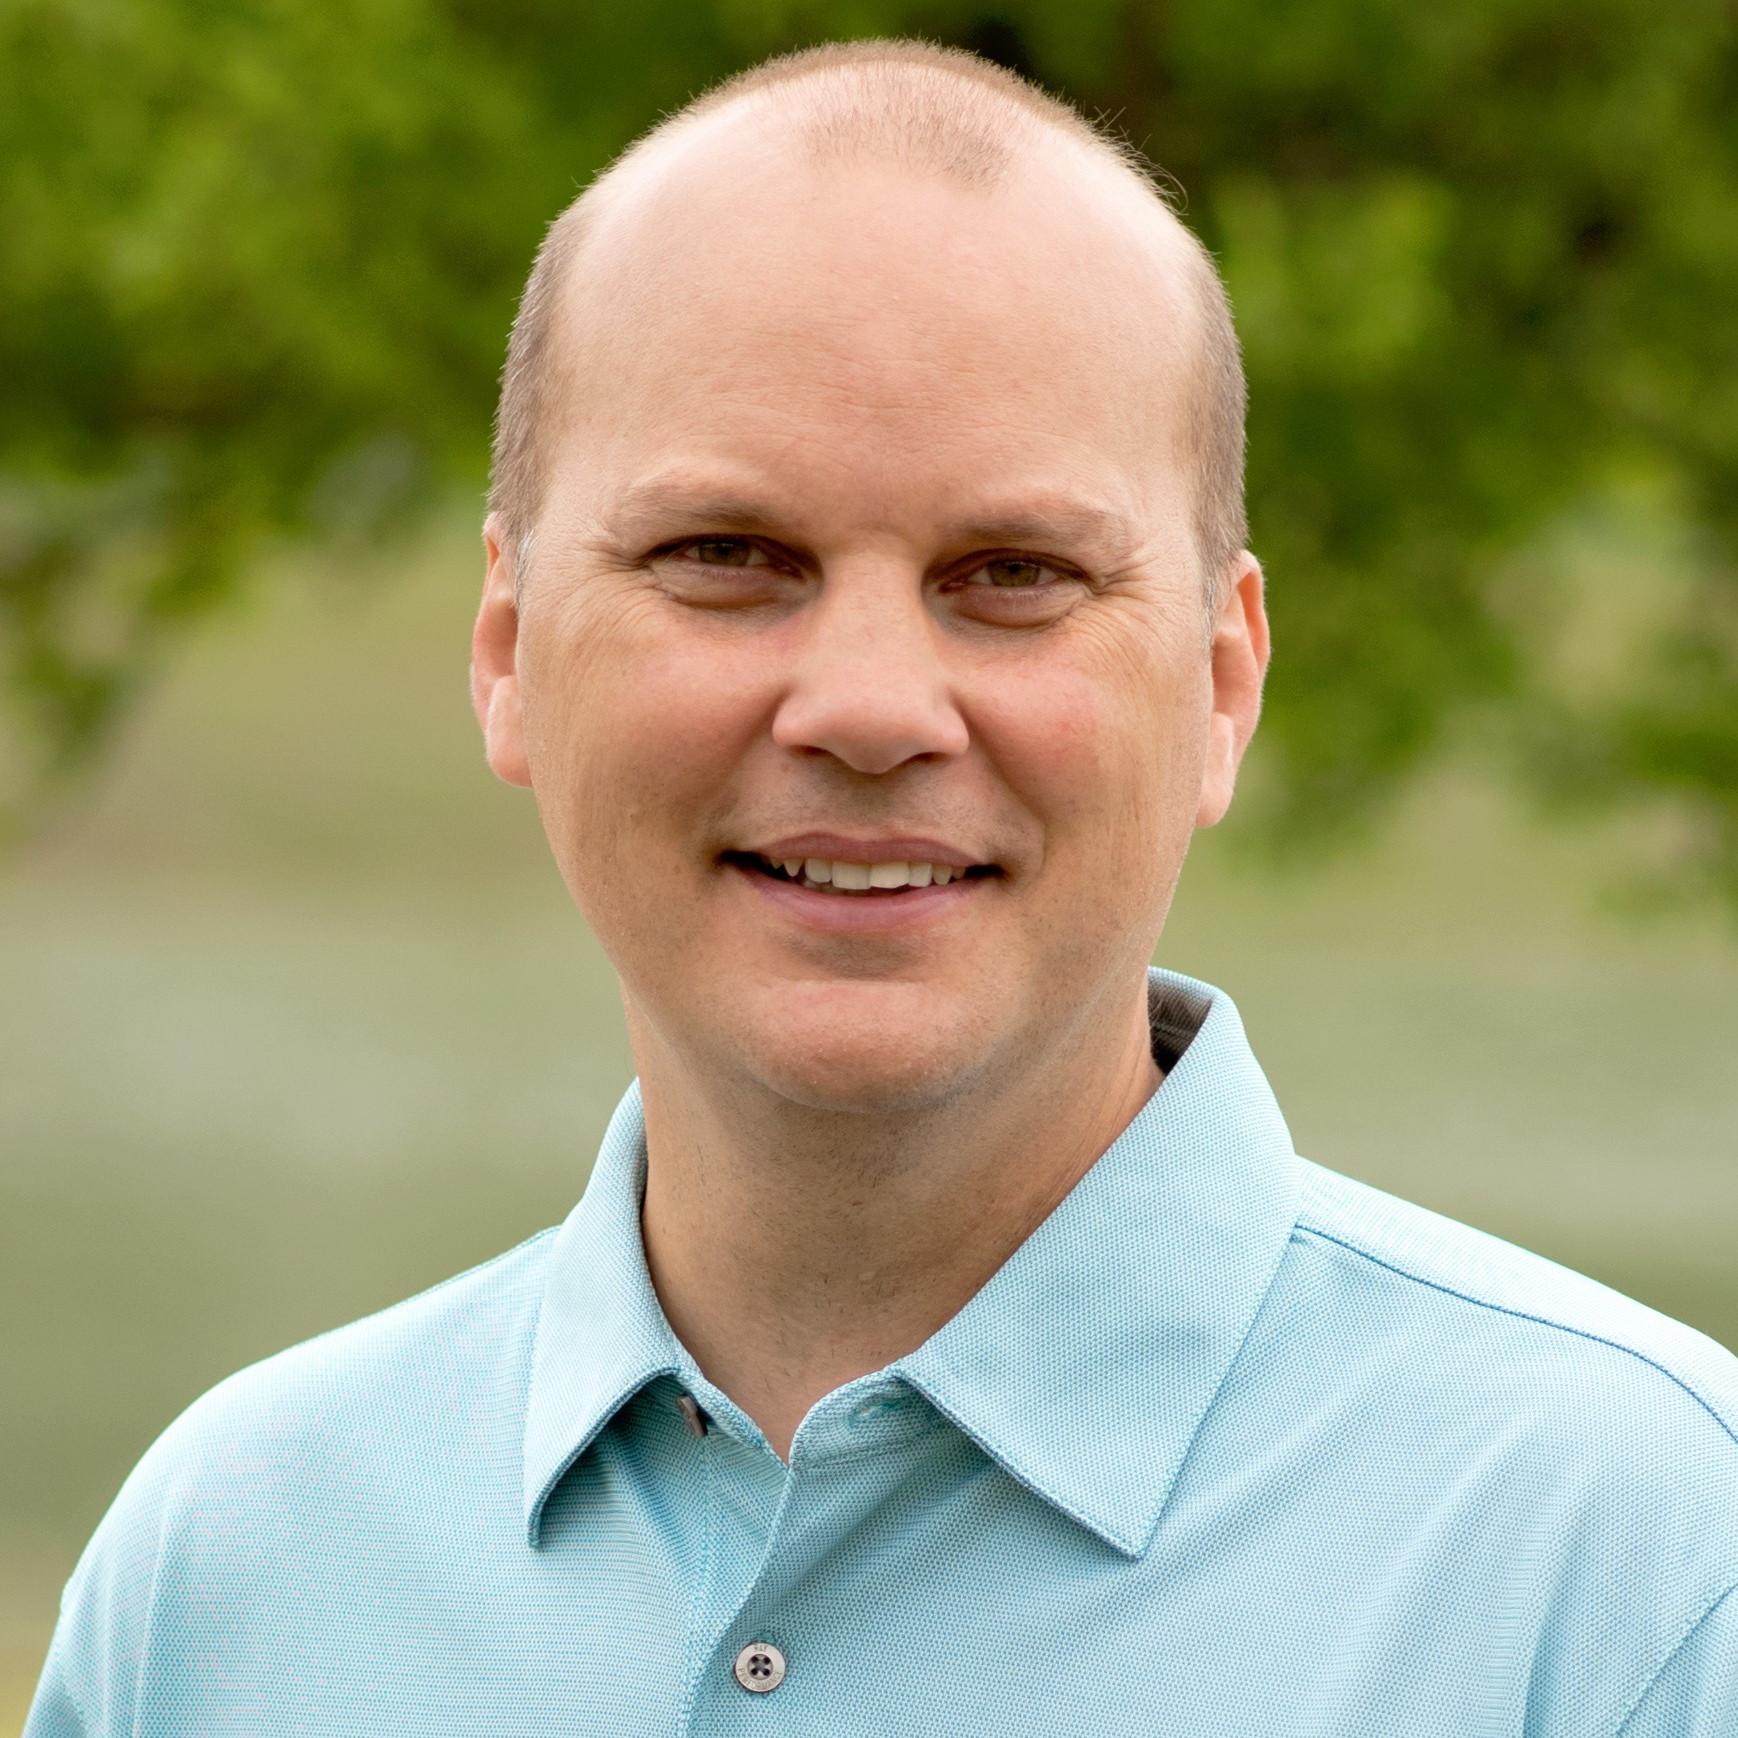 Eric McCormick